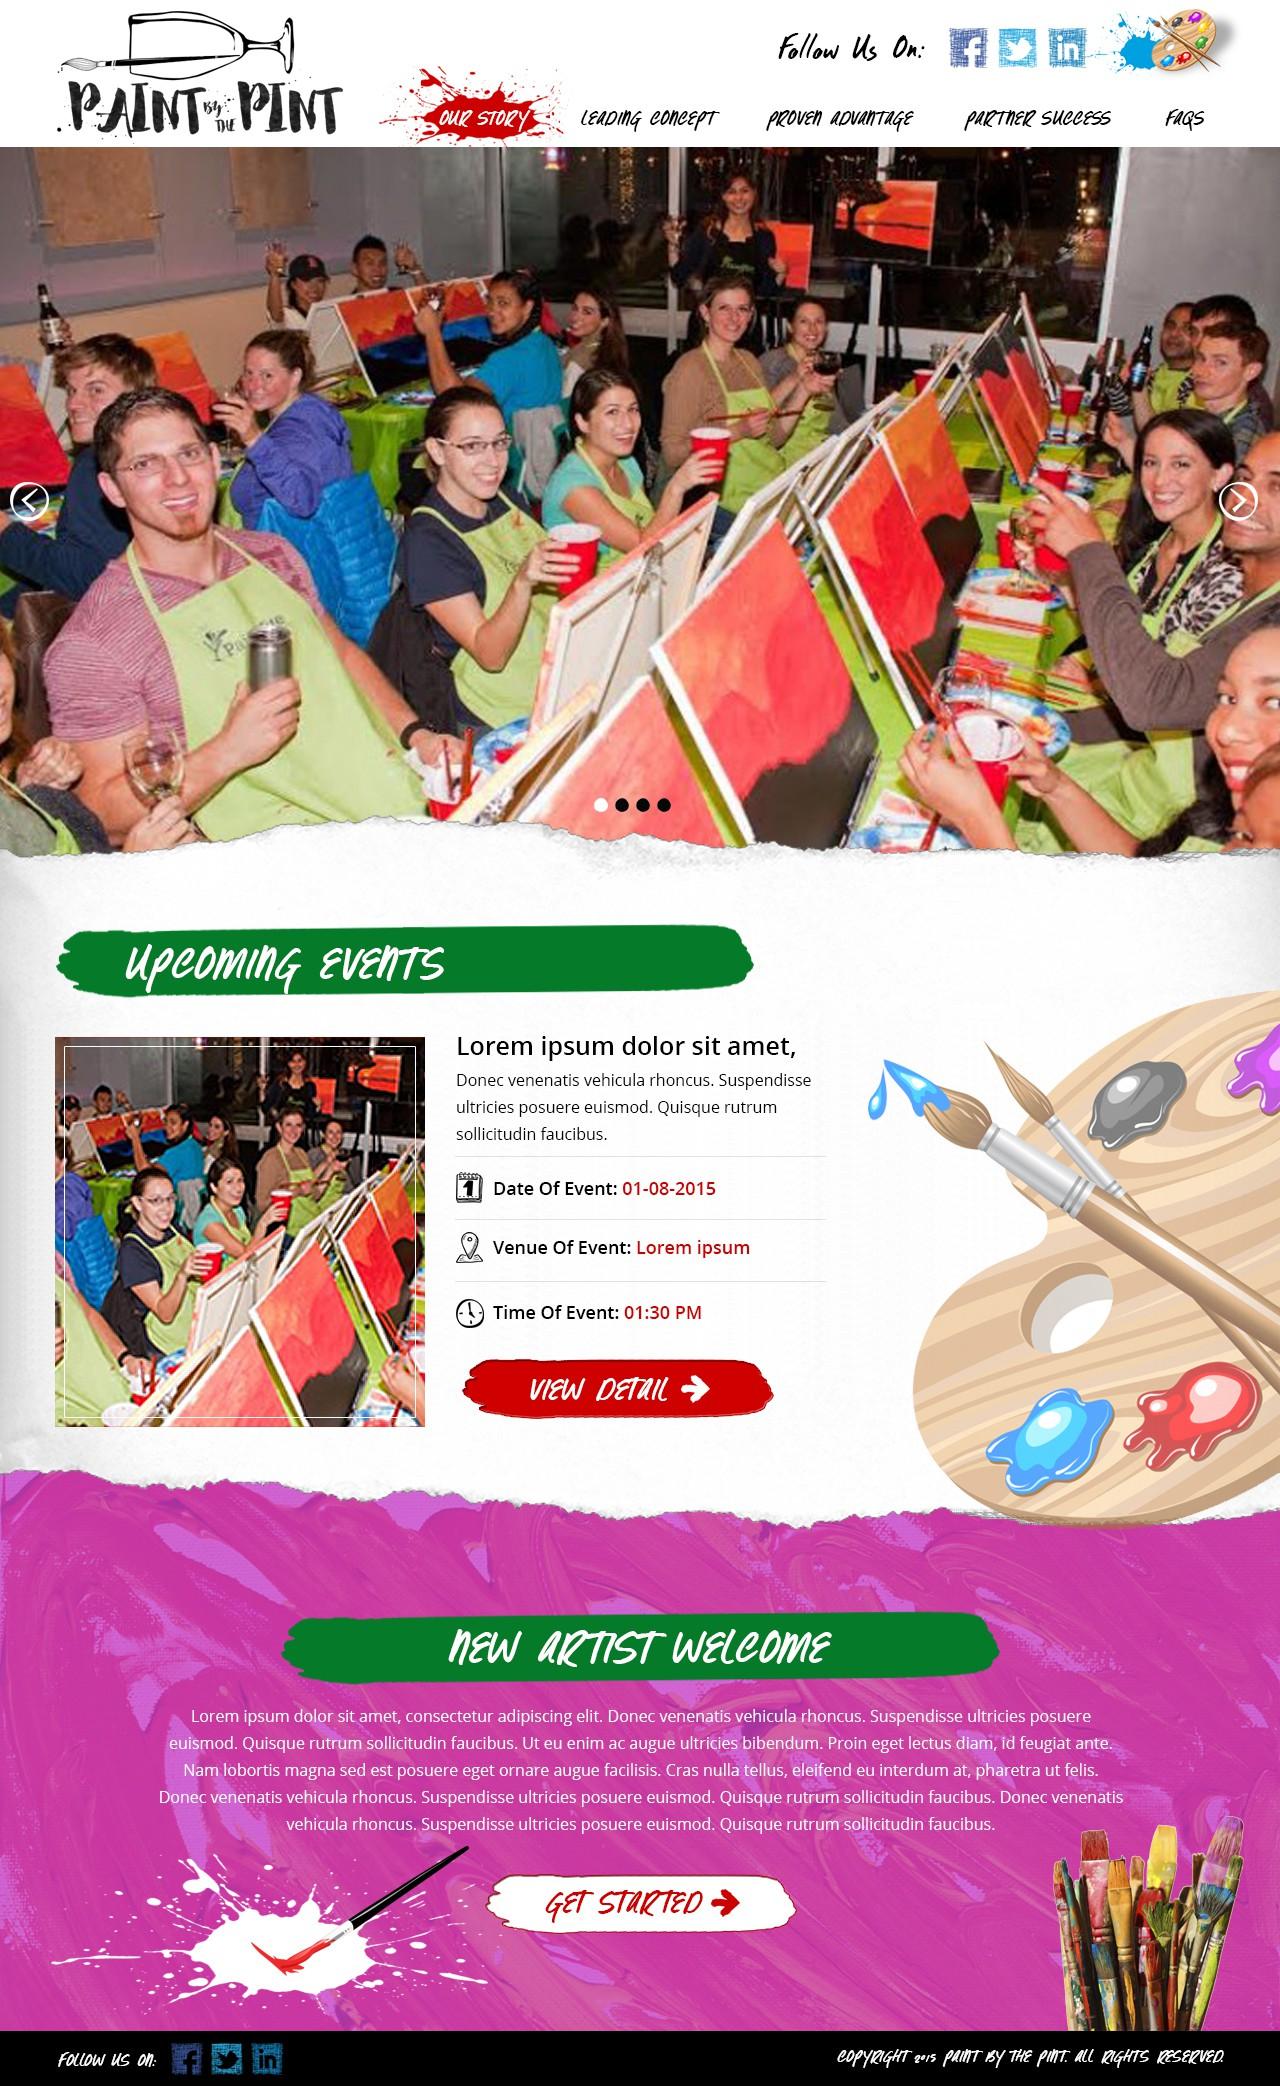 Design a landing page for fun, creative art evenings!